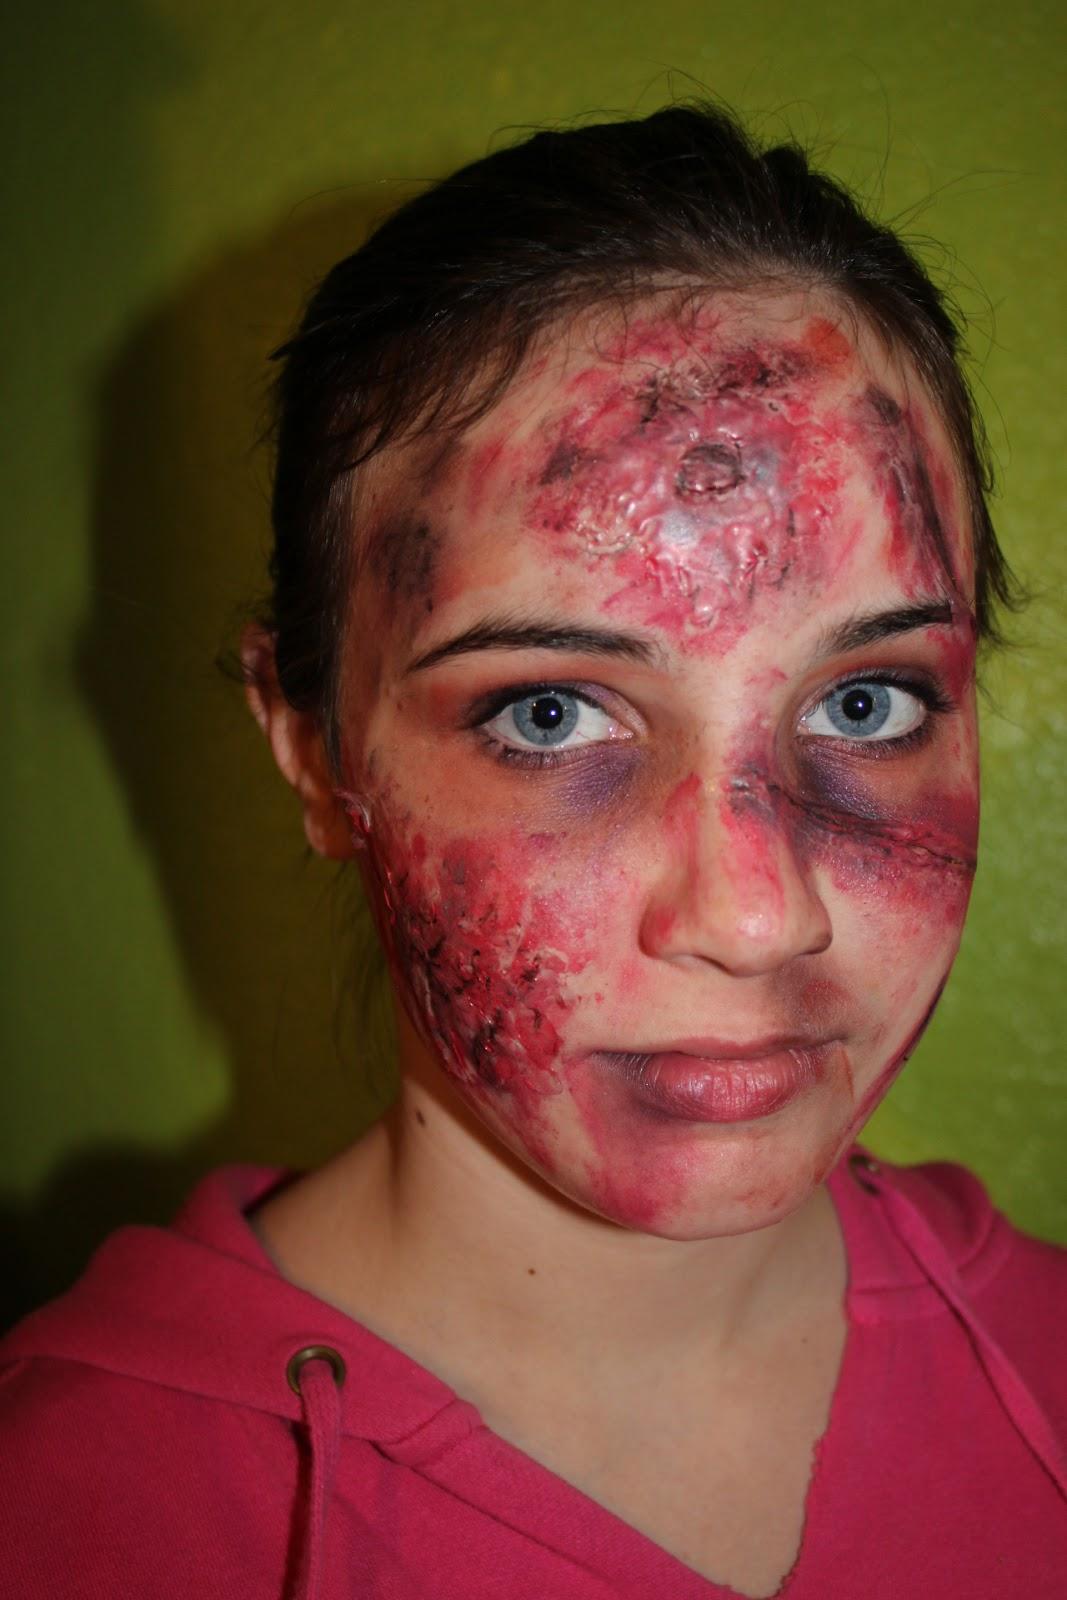 fashionably crafty paris: diy zombie makeup flesh how to tutorial